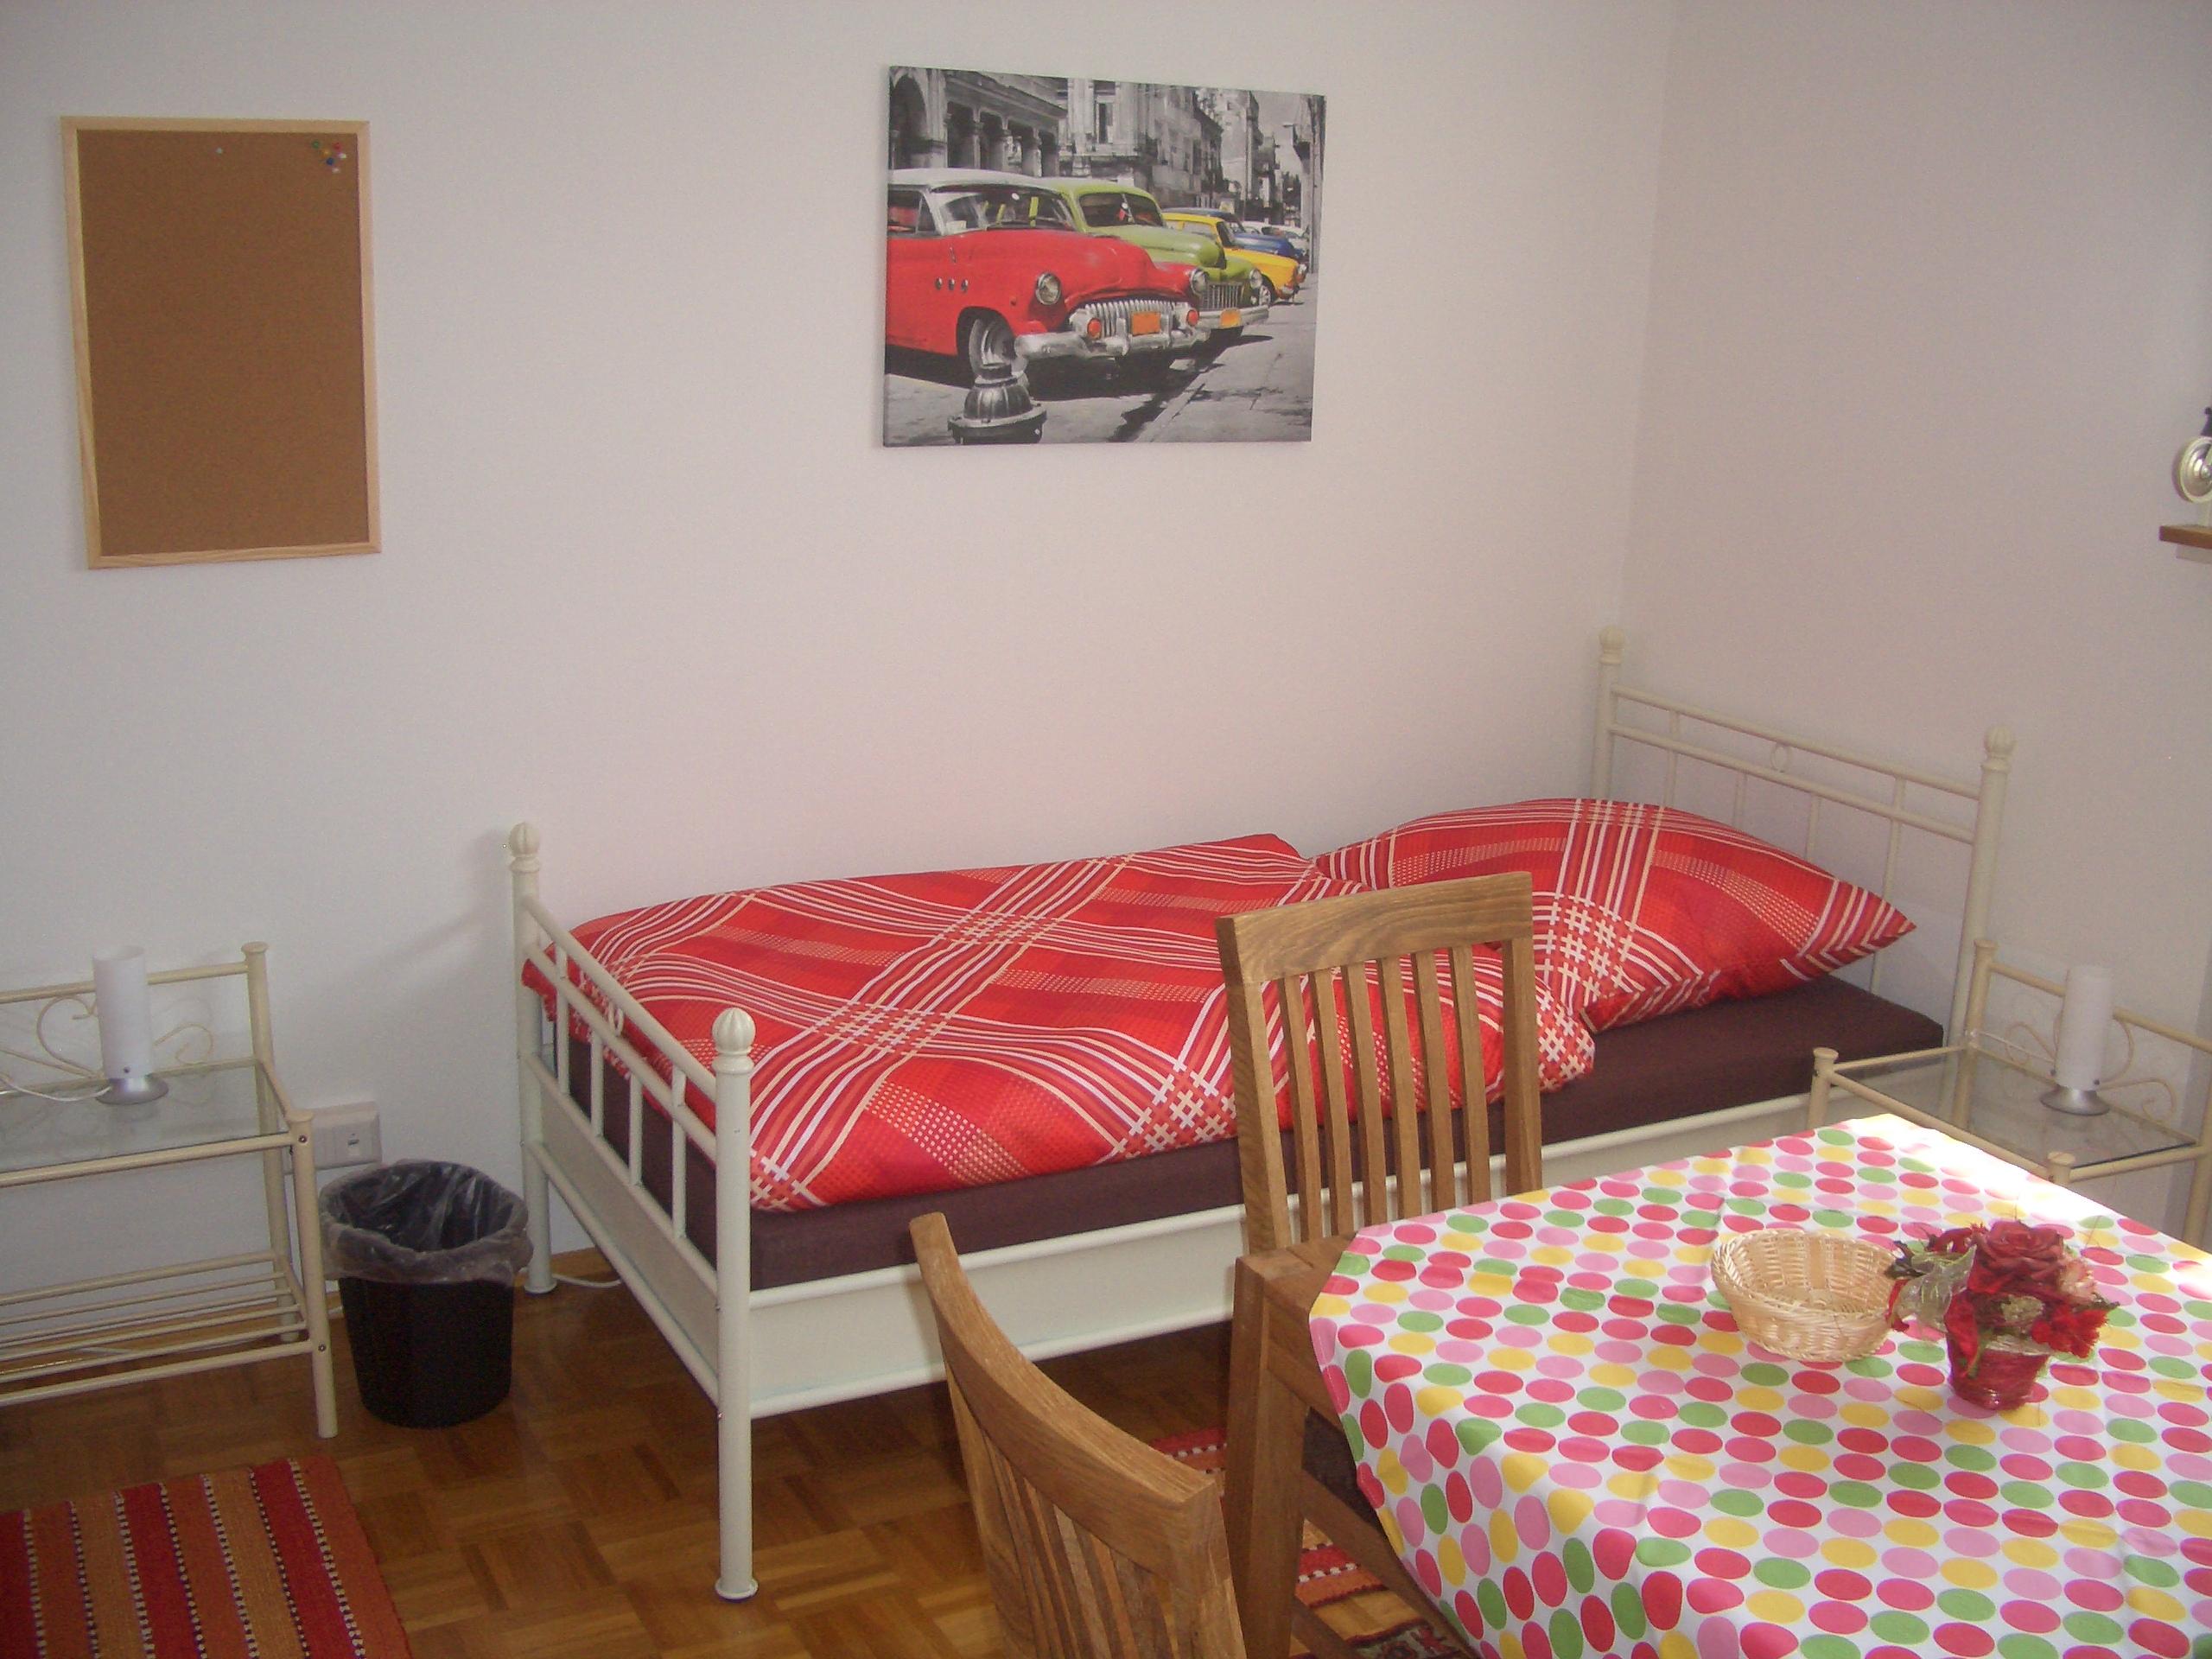 zimmer mieten in karlsruhe m blierte zimmer direkt mieten. Black Bedroom Furniture Sets. Home Design Ideas